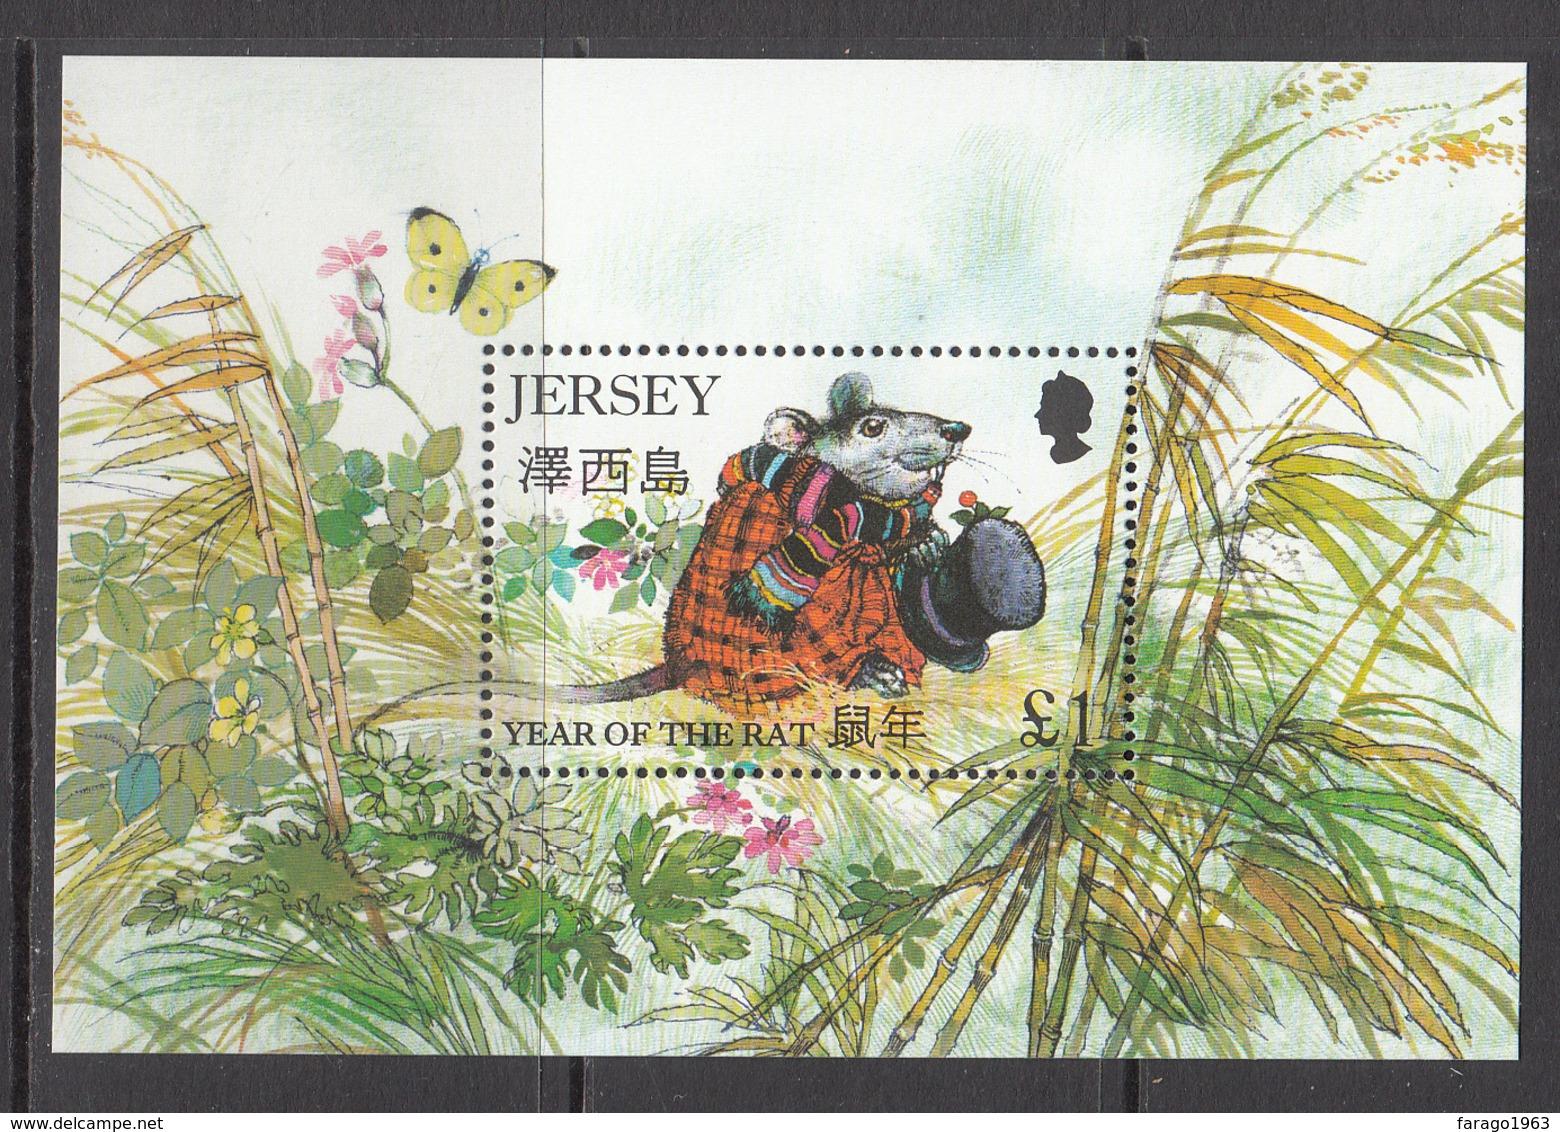 1996 Jersey Year Of The Rat China Souvenir Sheet MNH @ BELOW FACE VALUE - Jersey